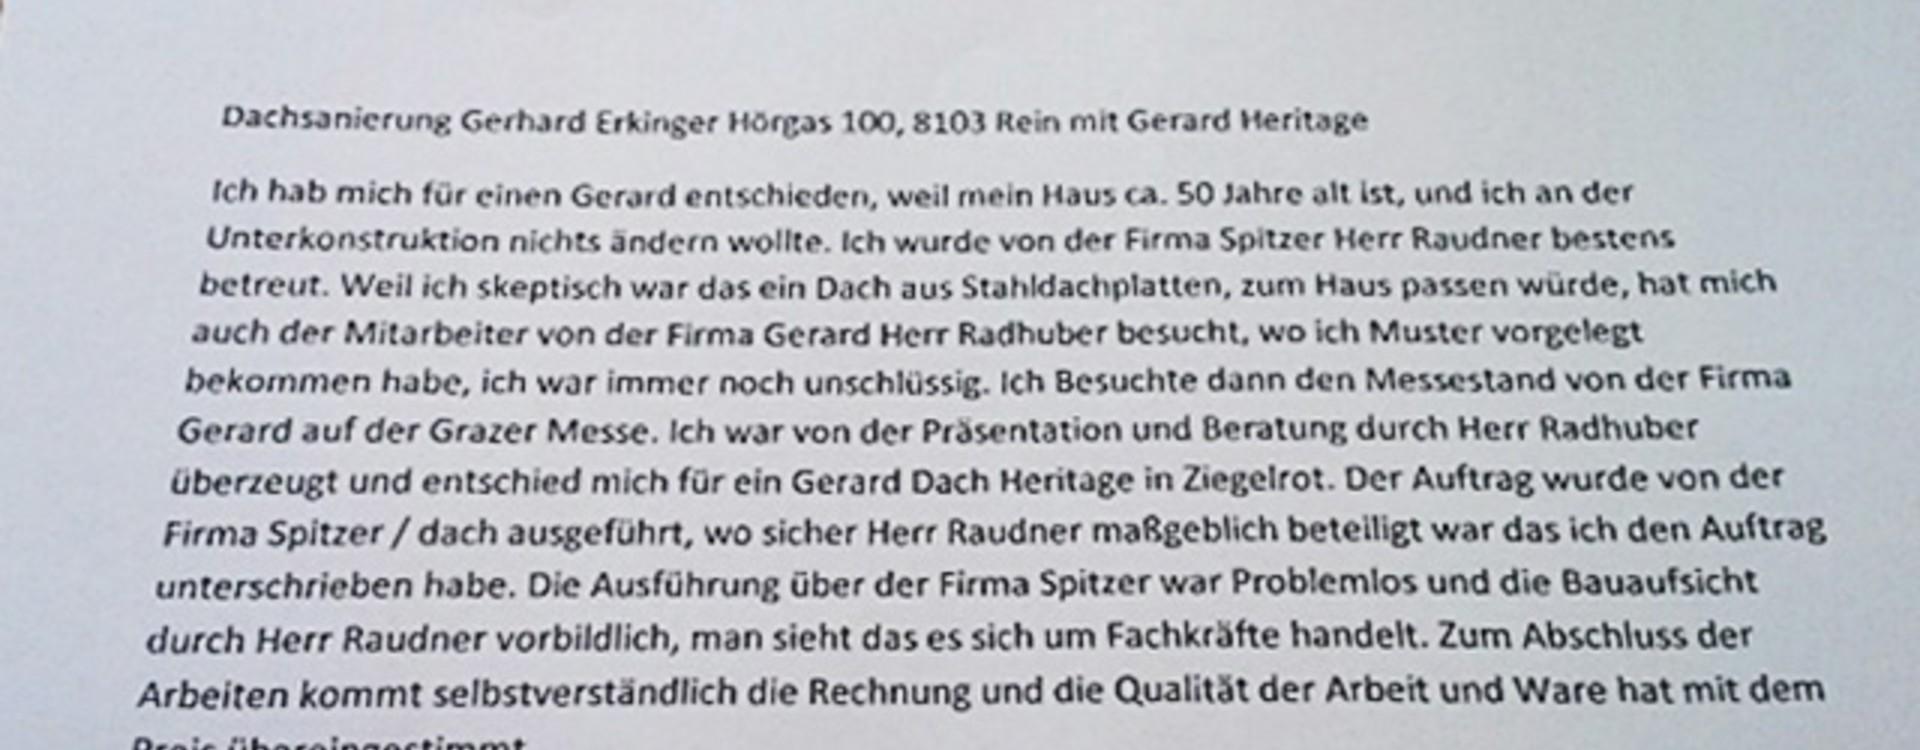 Gerard Heritage